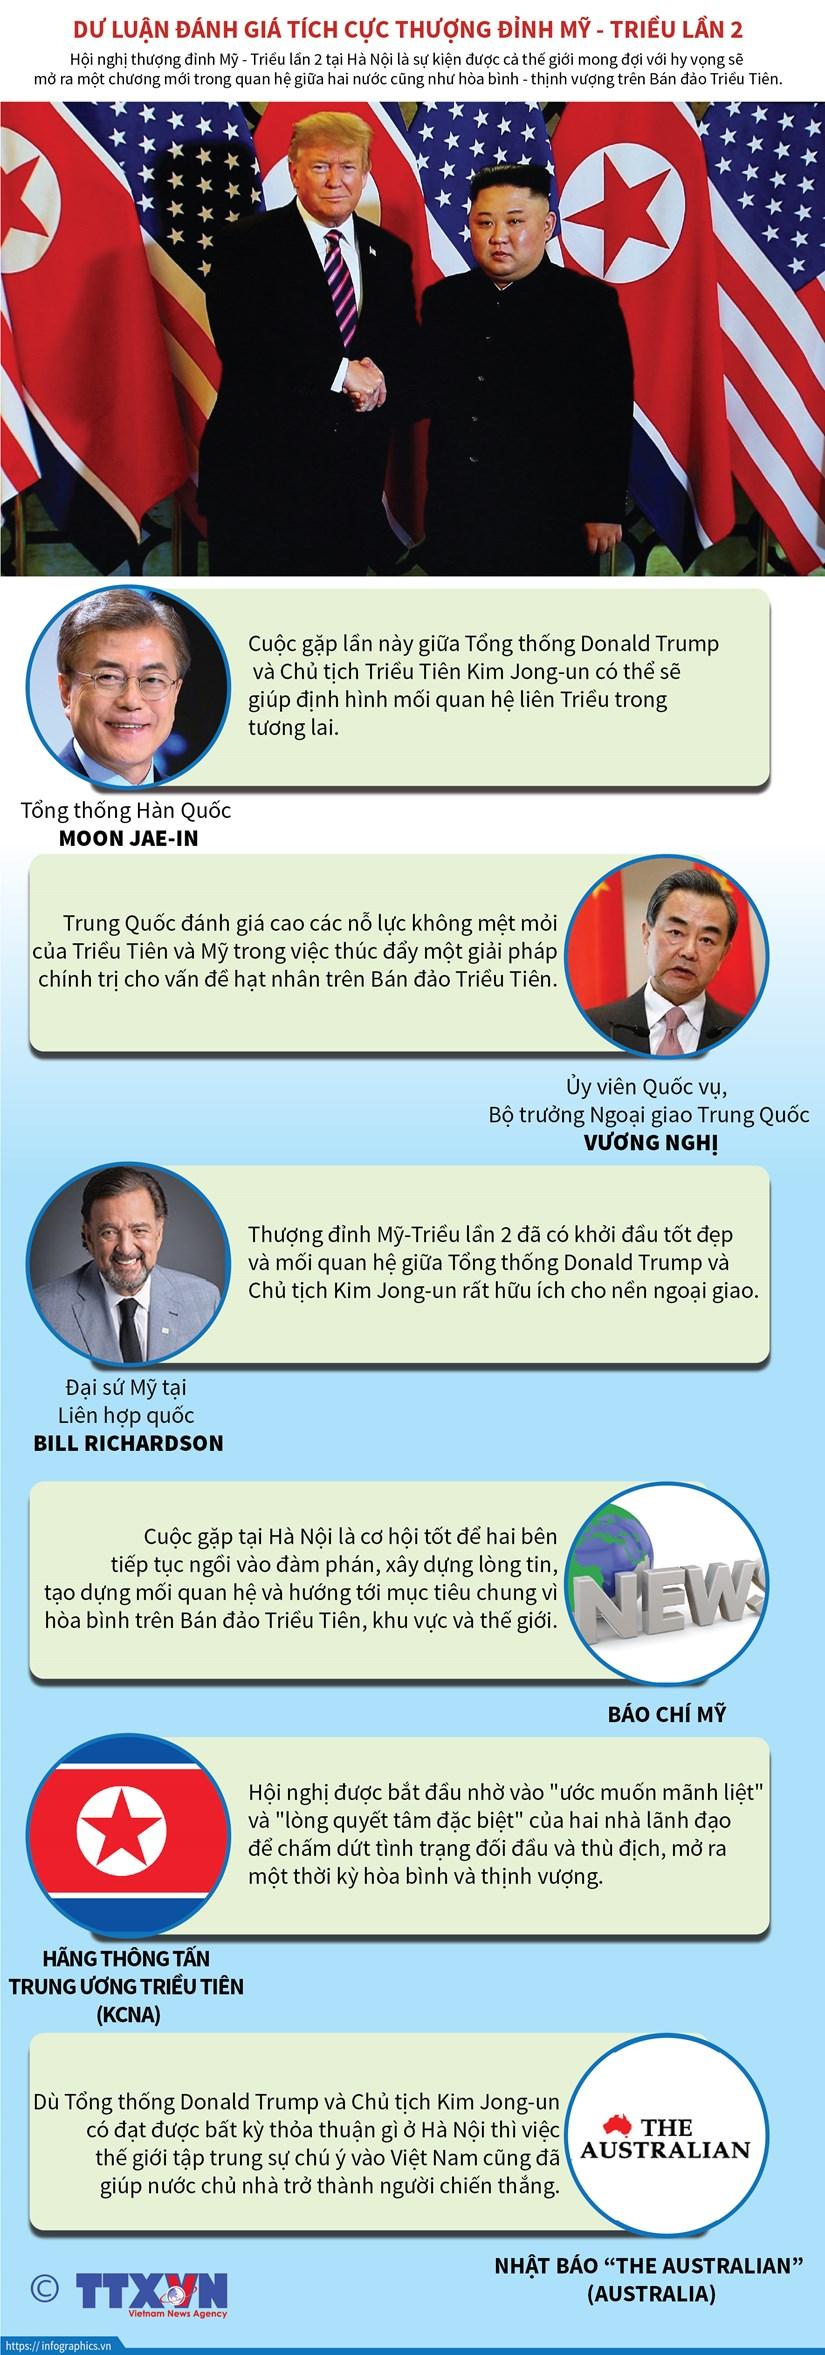 [Infographics] Du luan danh gia tich cuc ve Thuong dinh My-Trieu lan 2 hinh anh 1